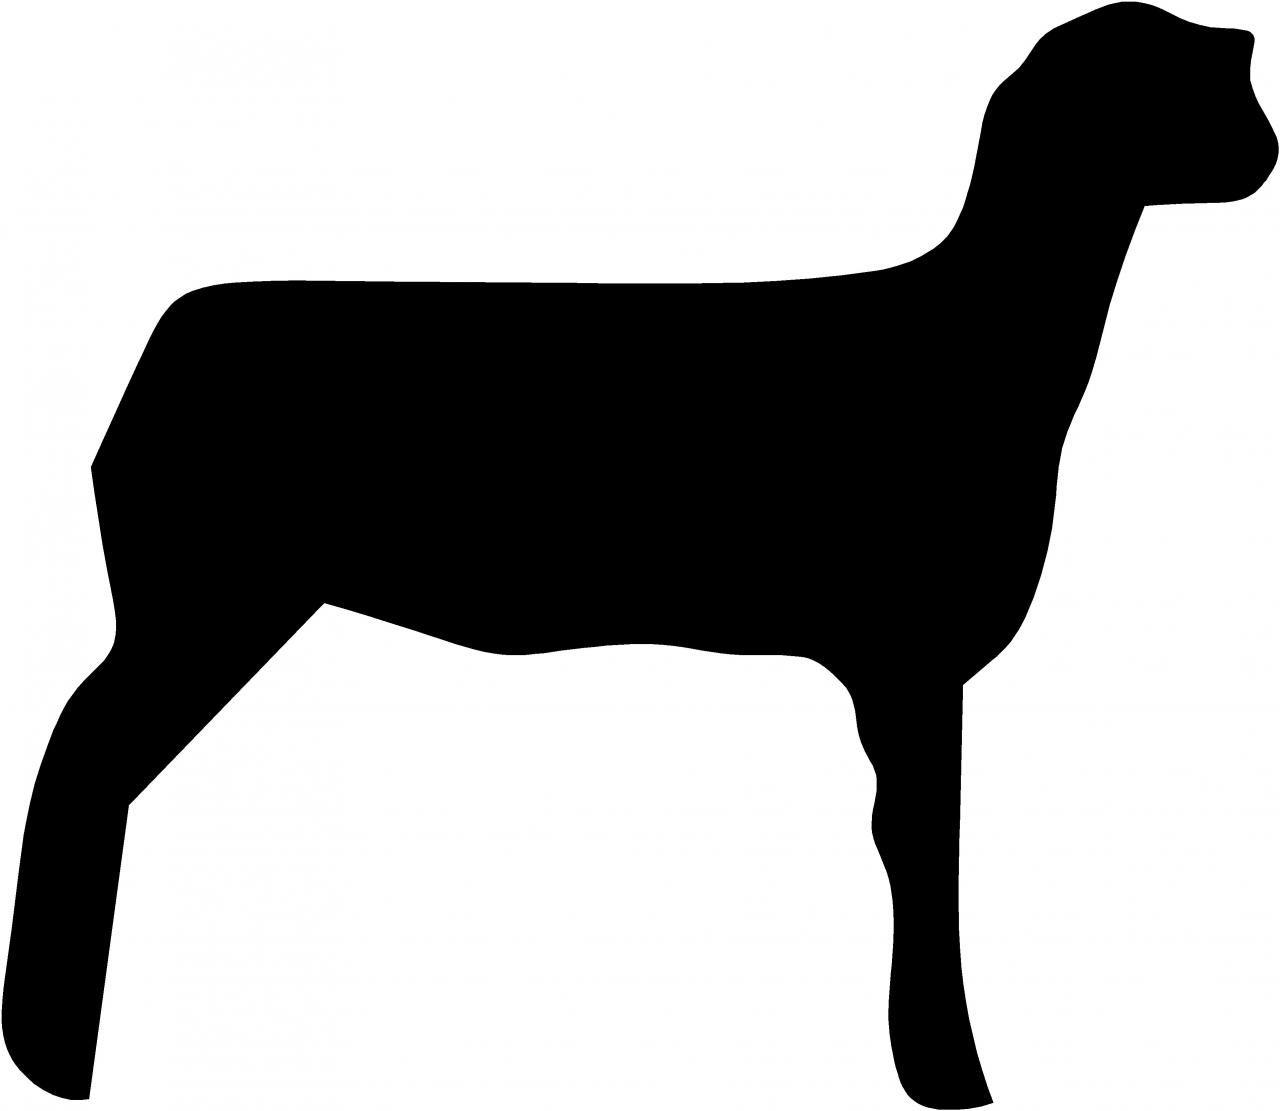 1280x1111 Go Back Images For Show Sheep Silhouette Cricut Image Ideas